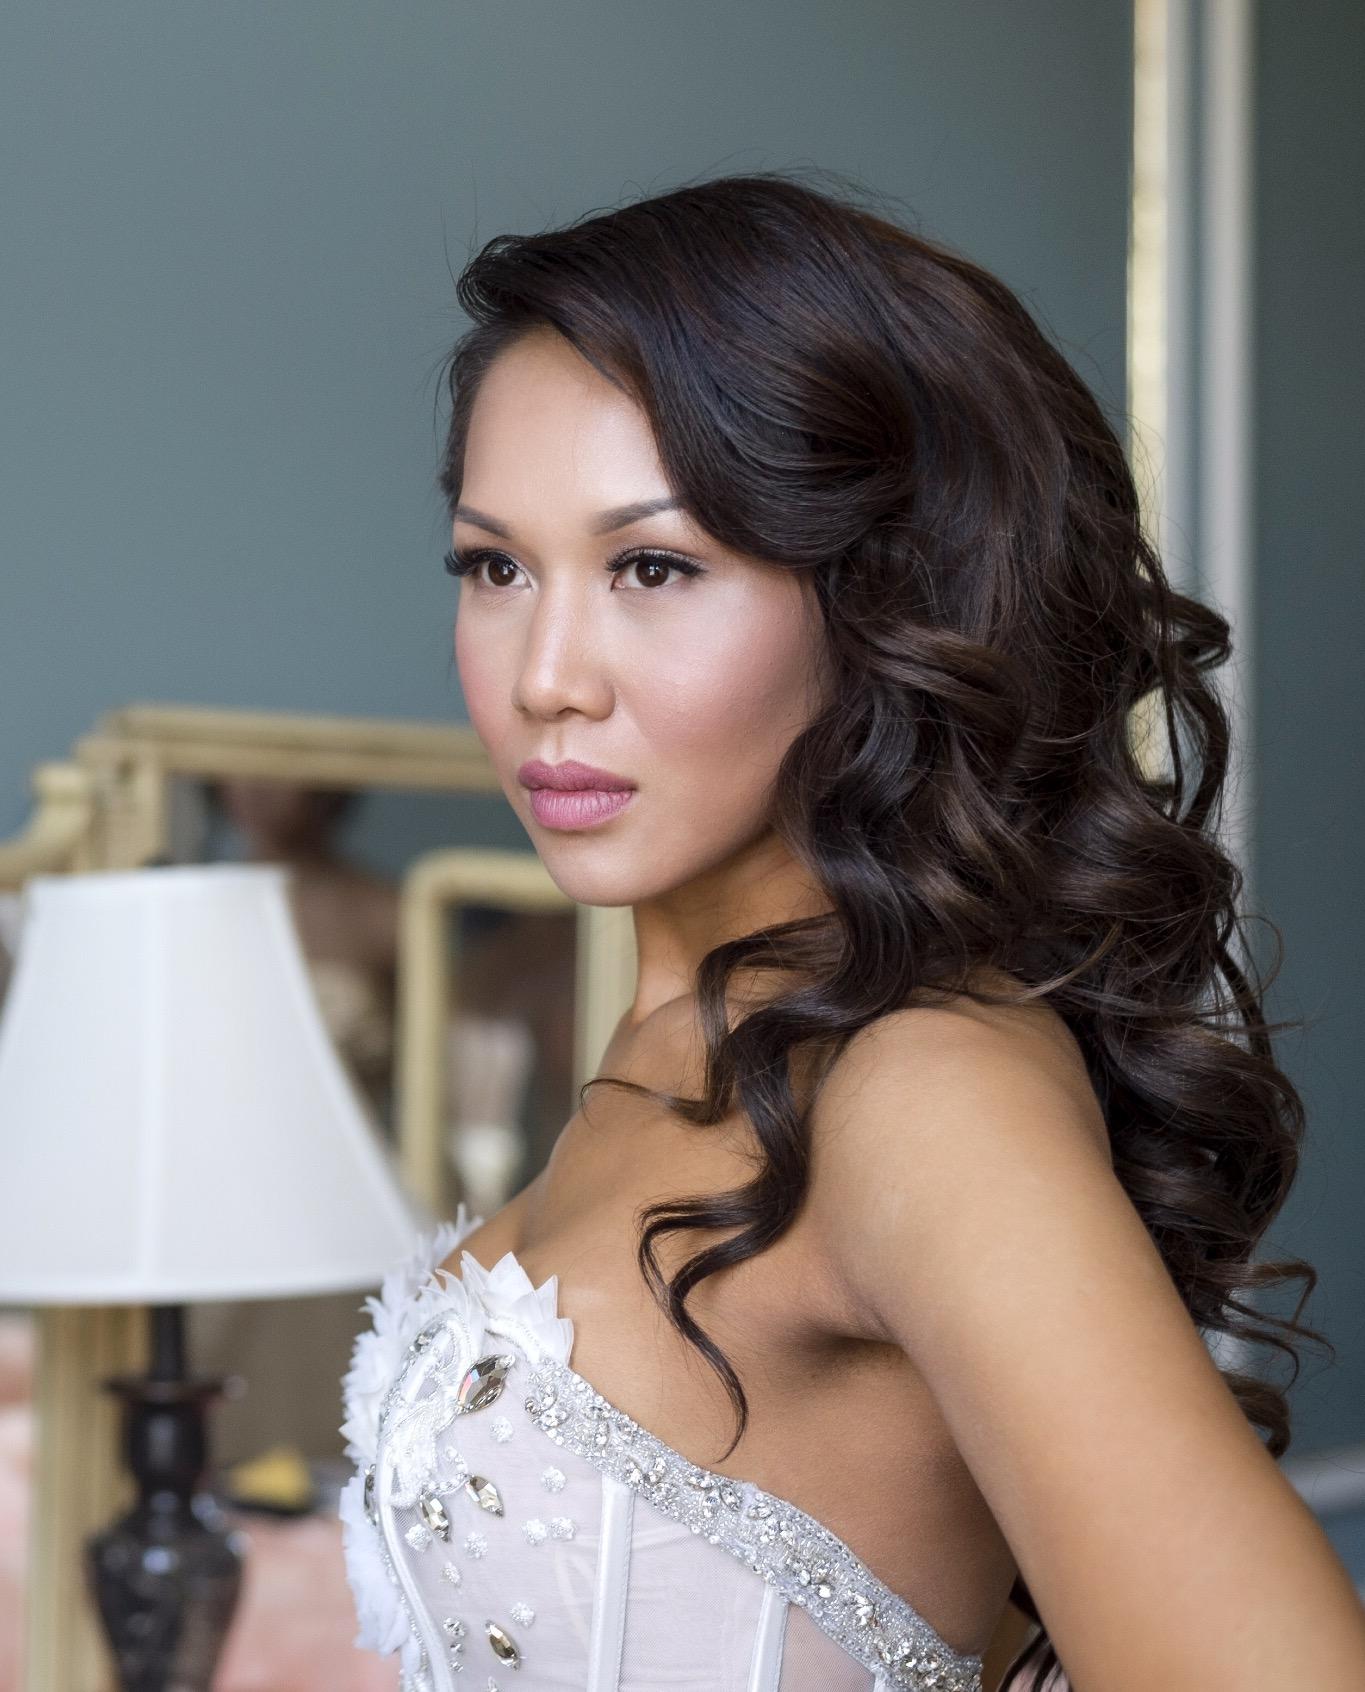 Tianna-Tran-Vancouver-Wedding-Makeup-Artist-Bridal-008.jpg